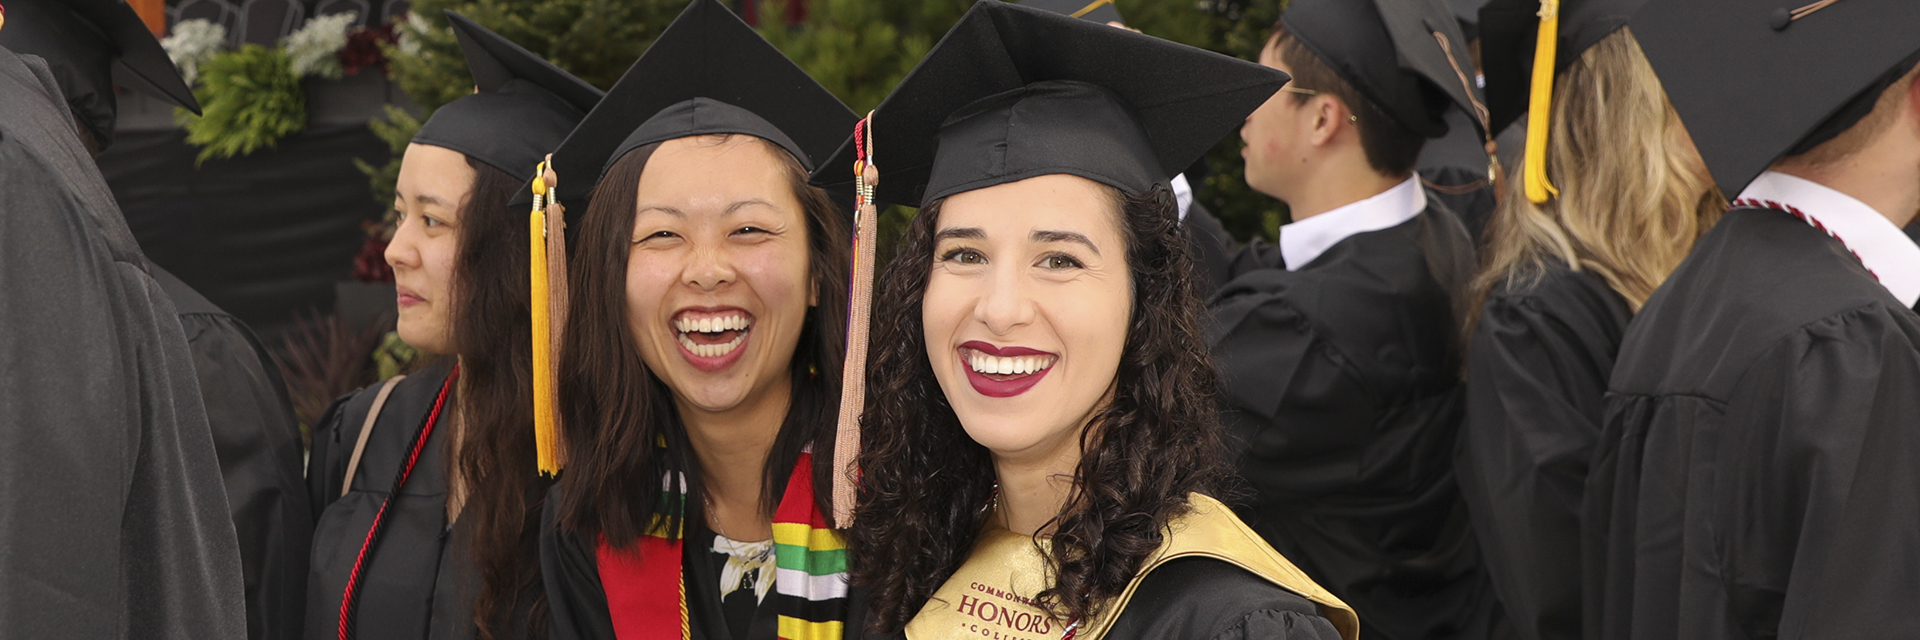 Umass Lowell Graduation 2020.Commencement 2020 Umass Amherst